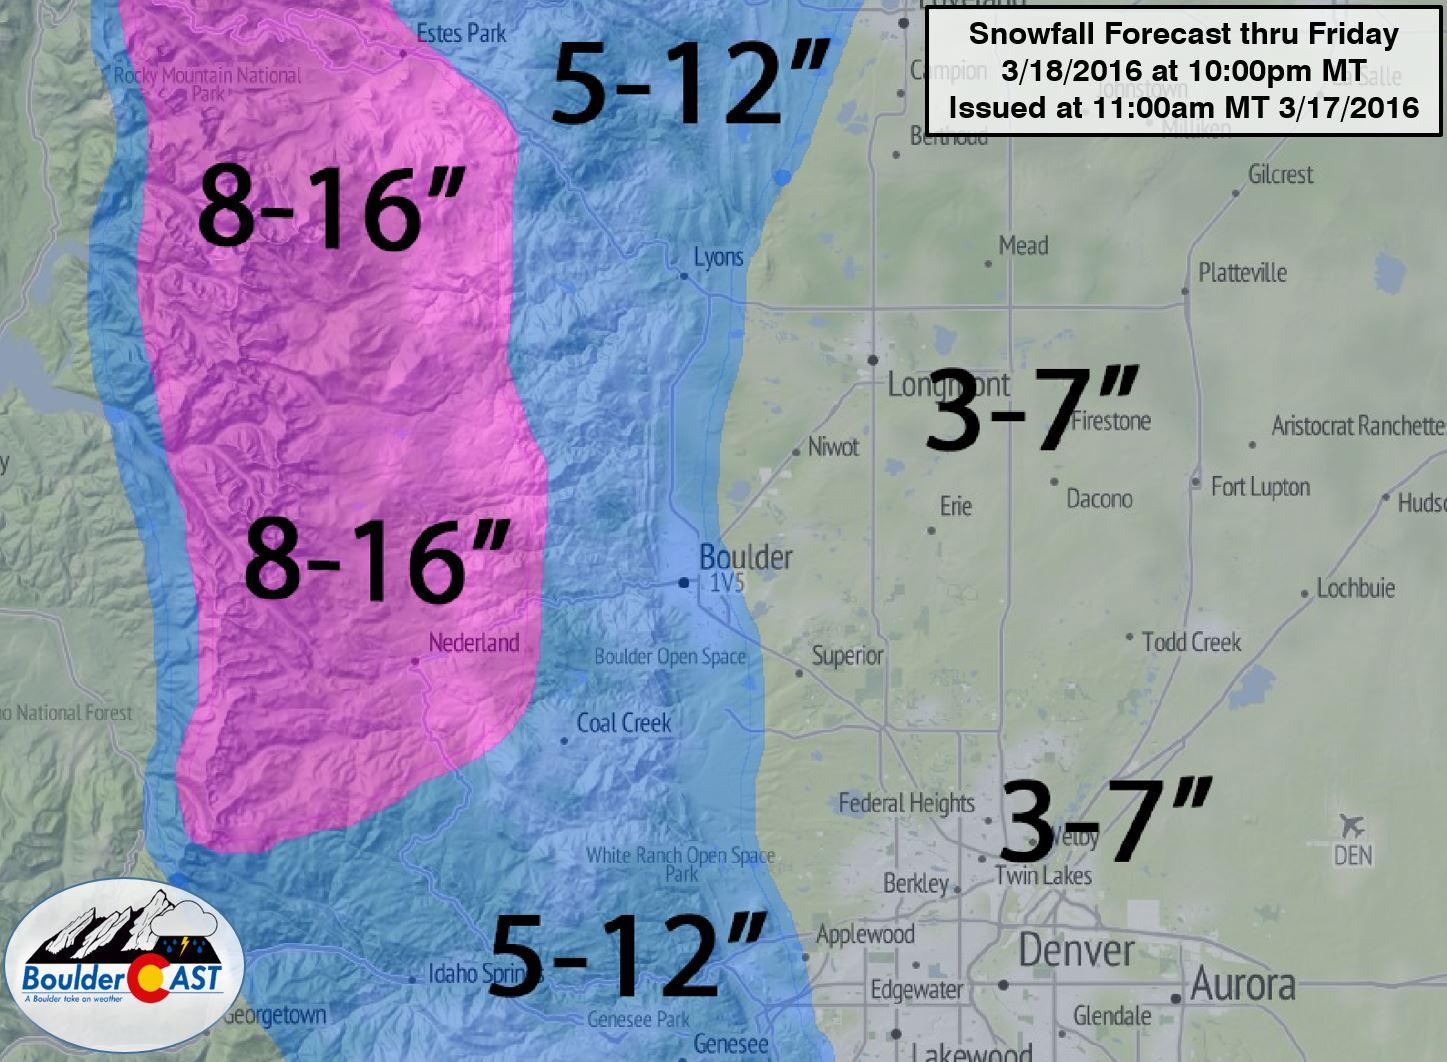 SnowForecast3-17-16